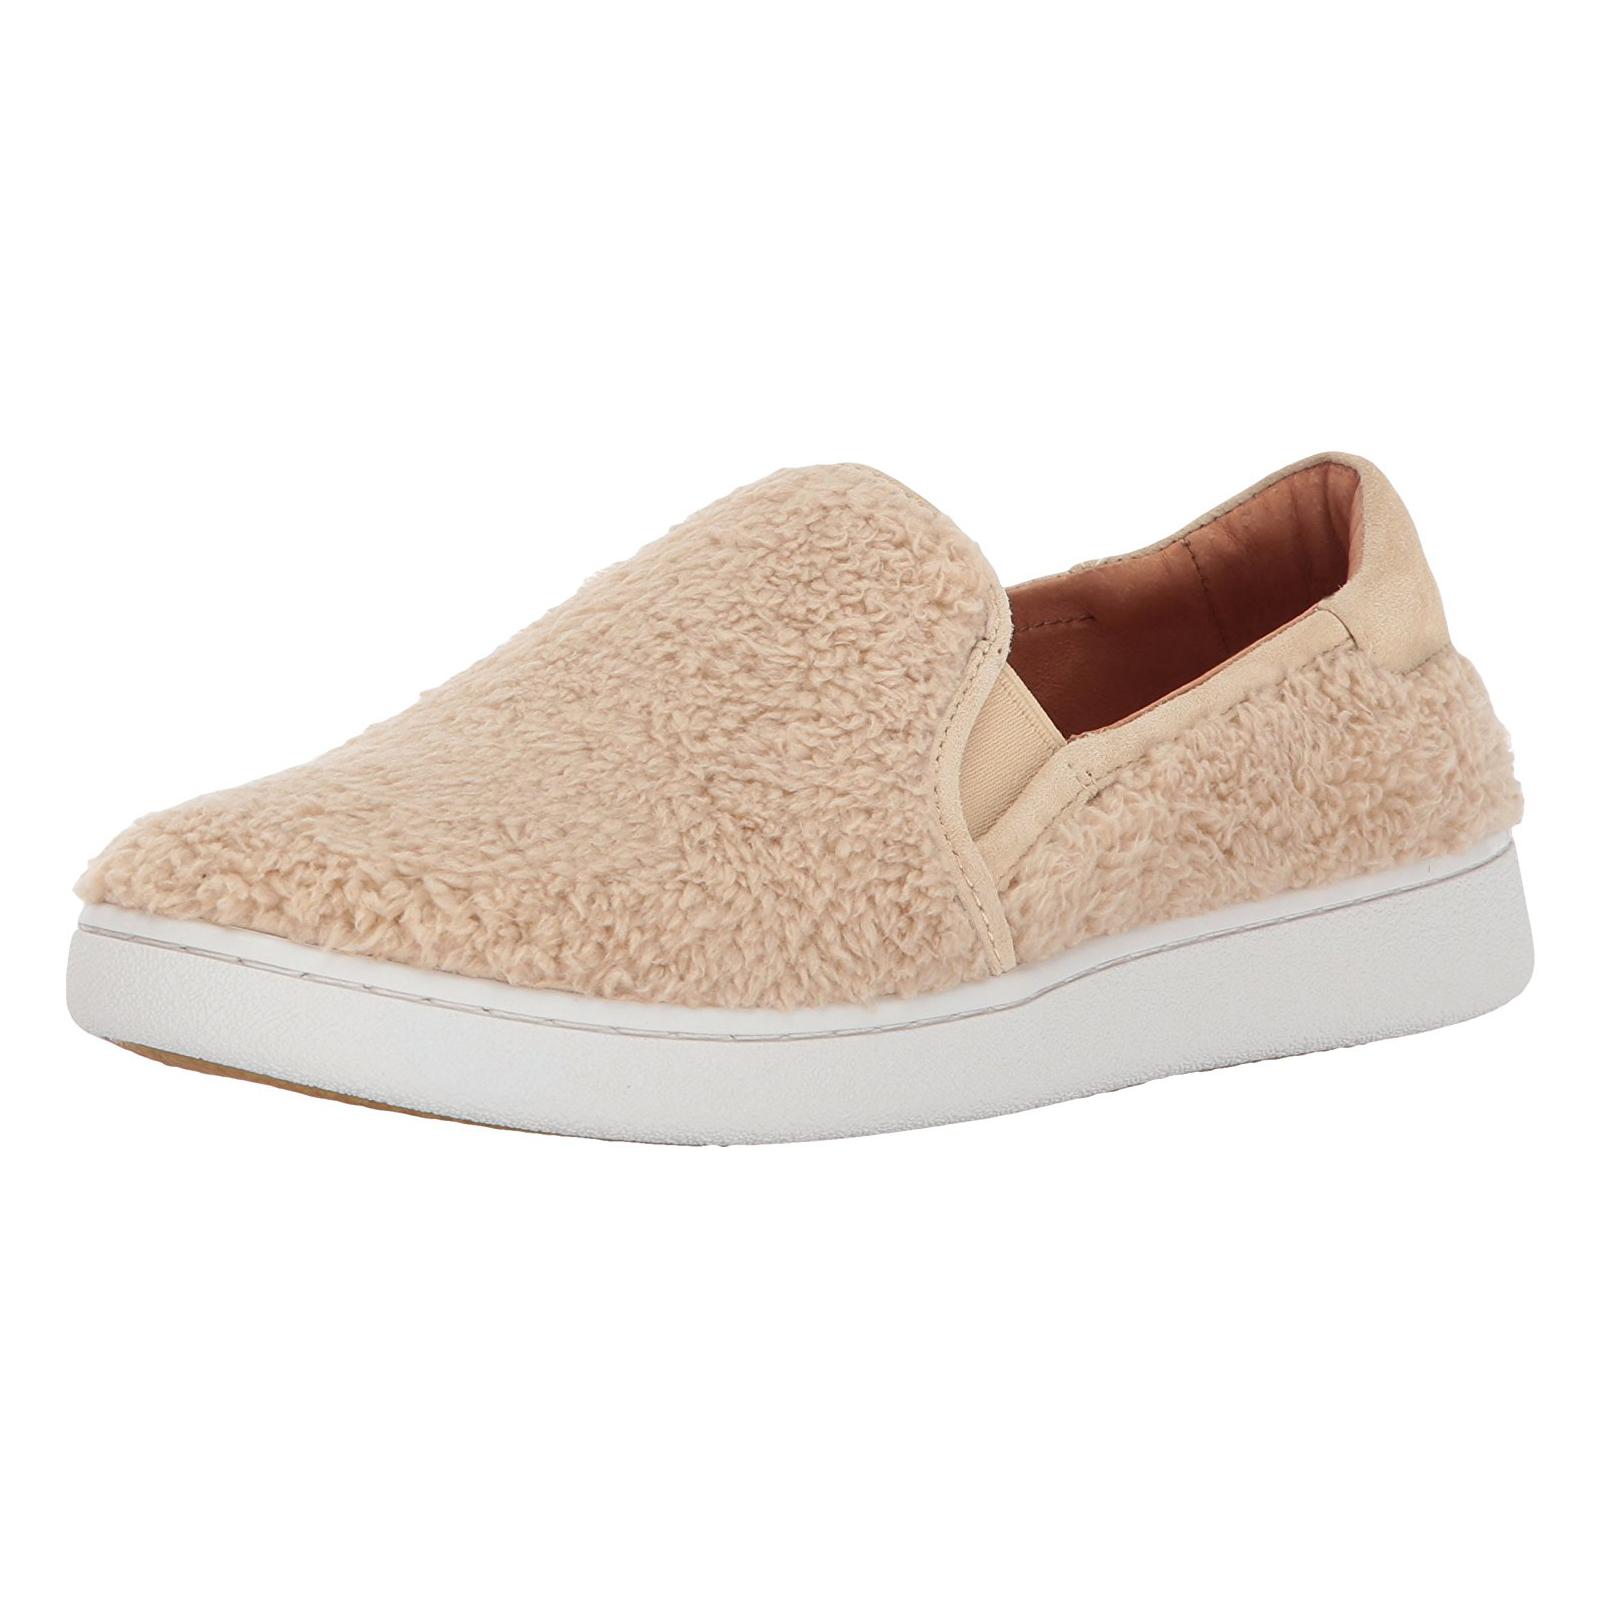 Ugg Sneakers Ricci Natural Beige